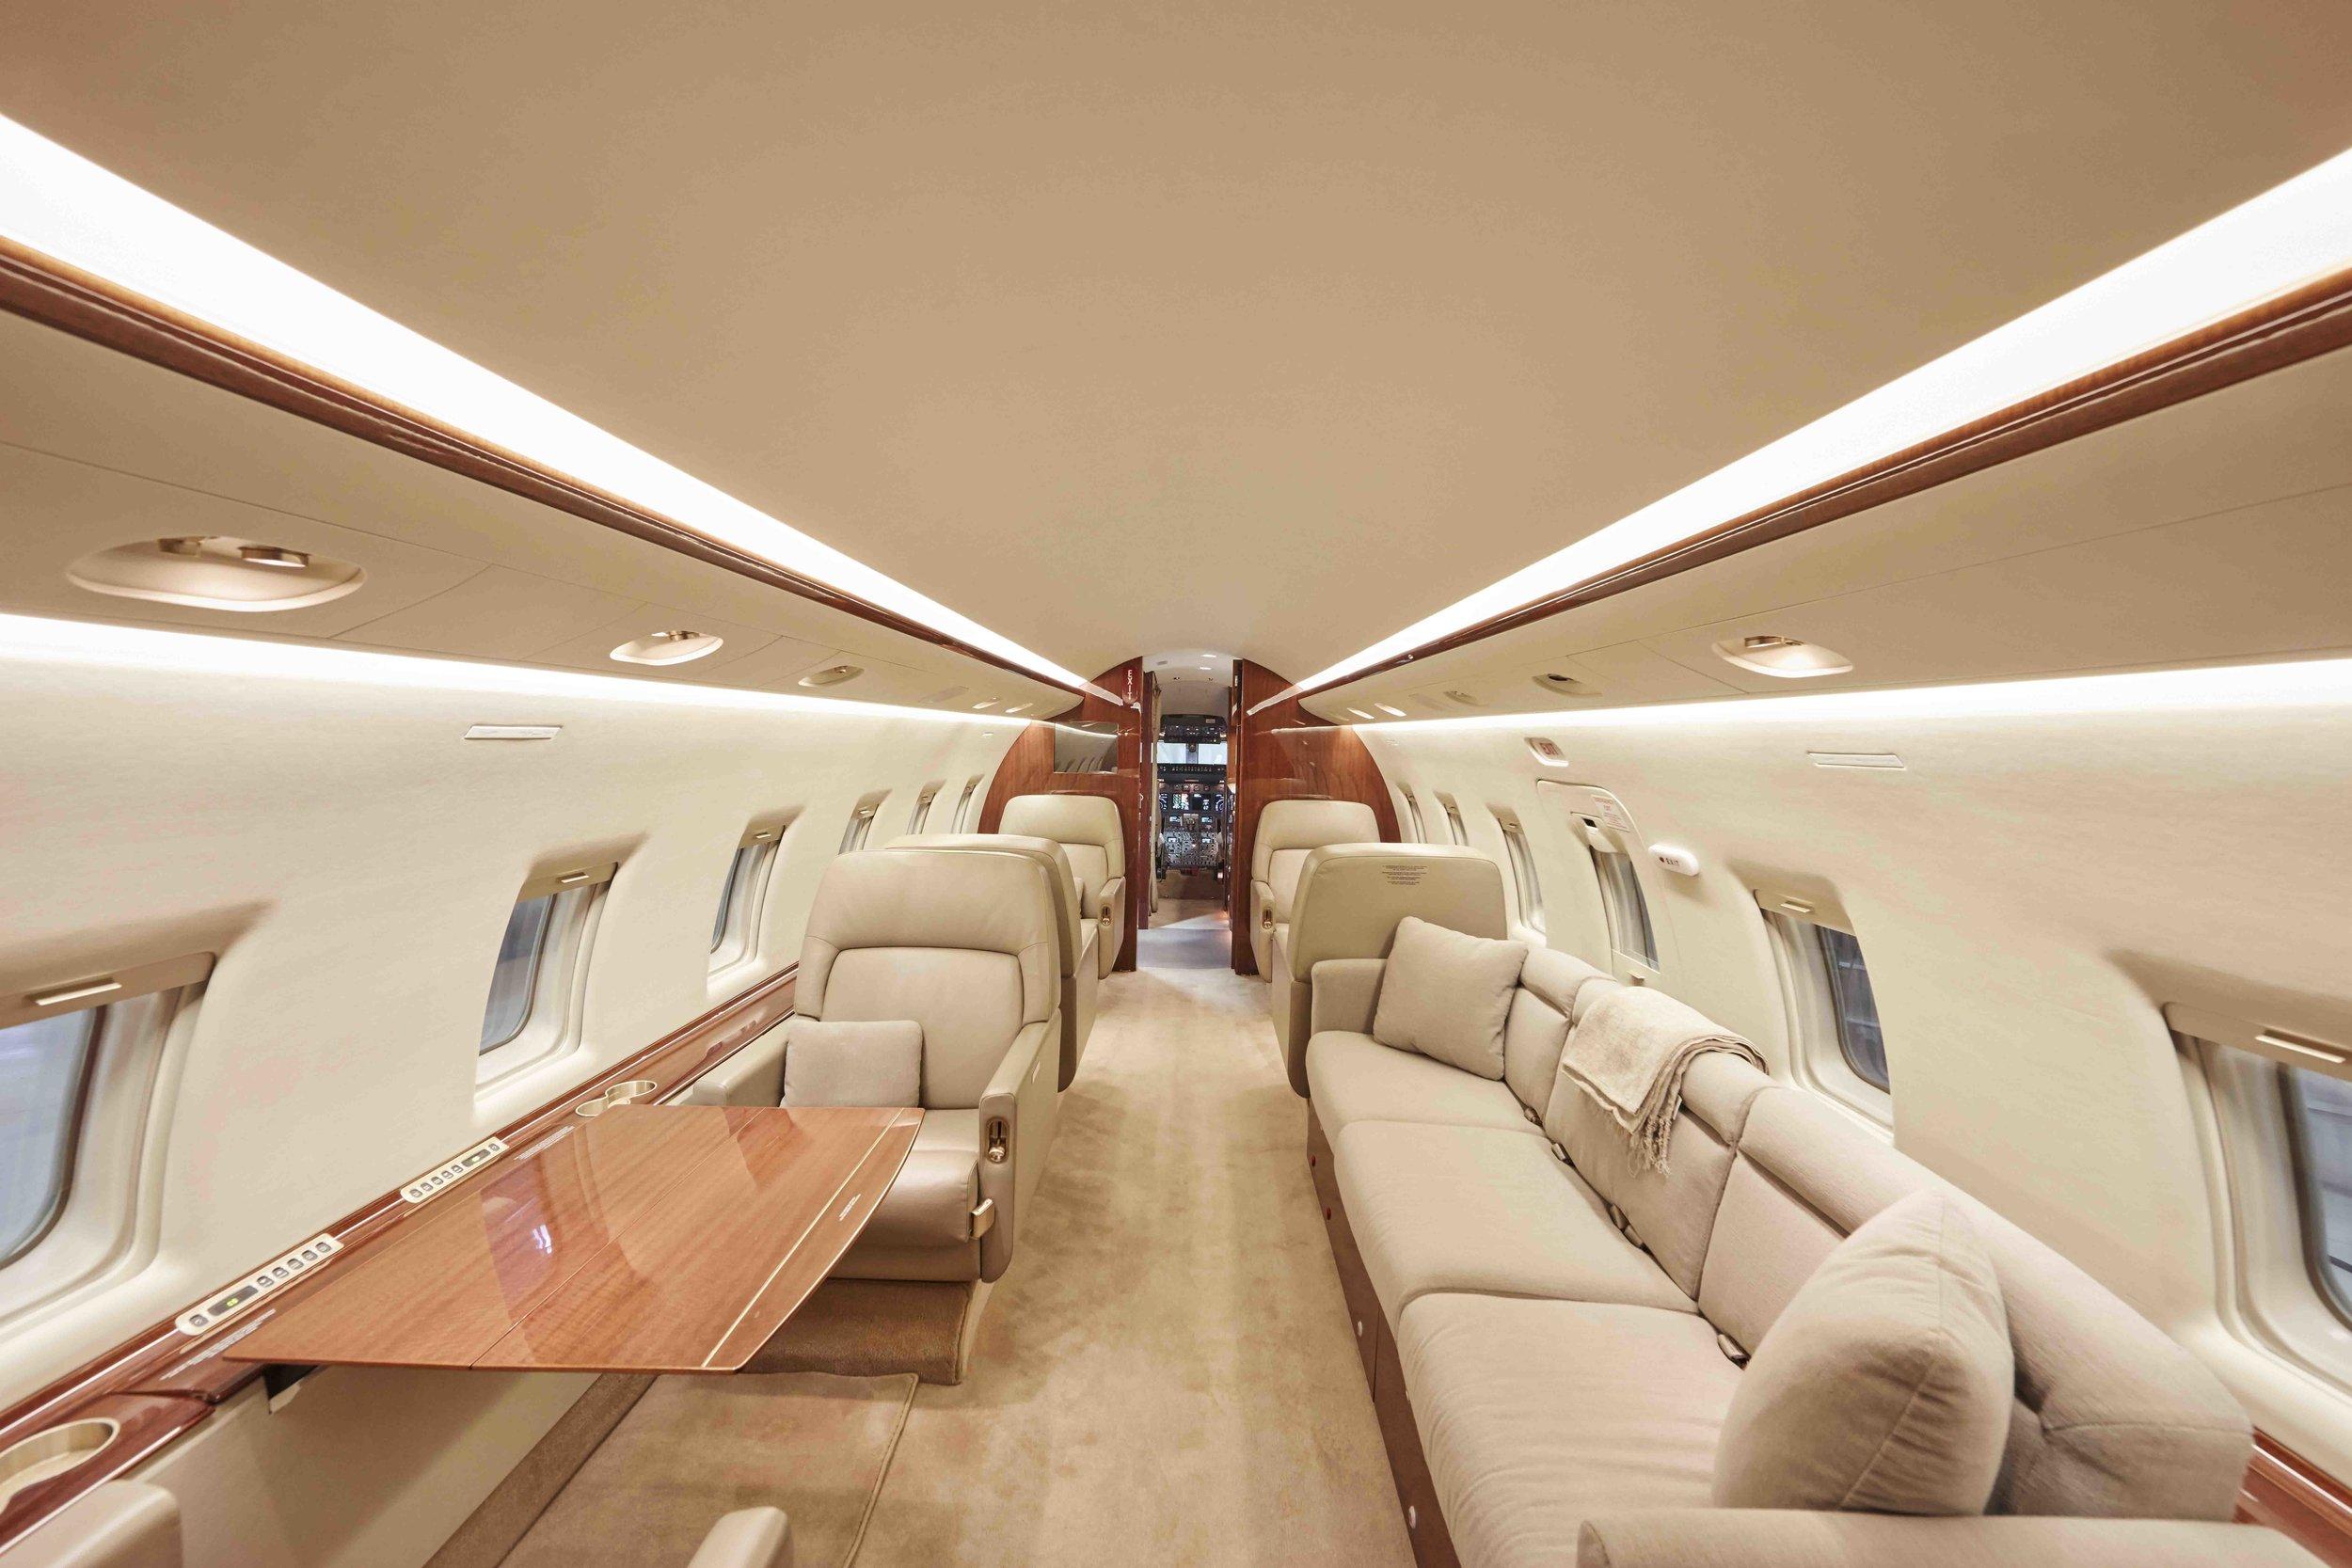 2005 Challenger 604 For Sale Interior 9